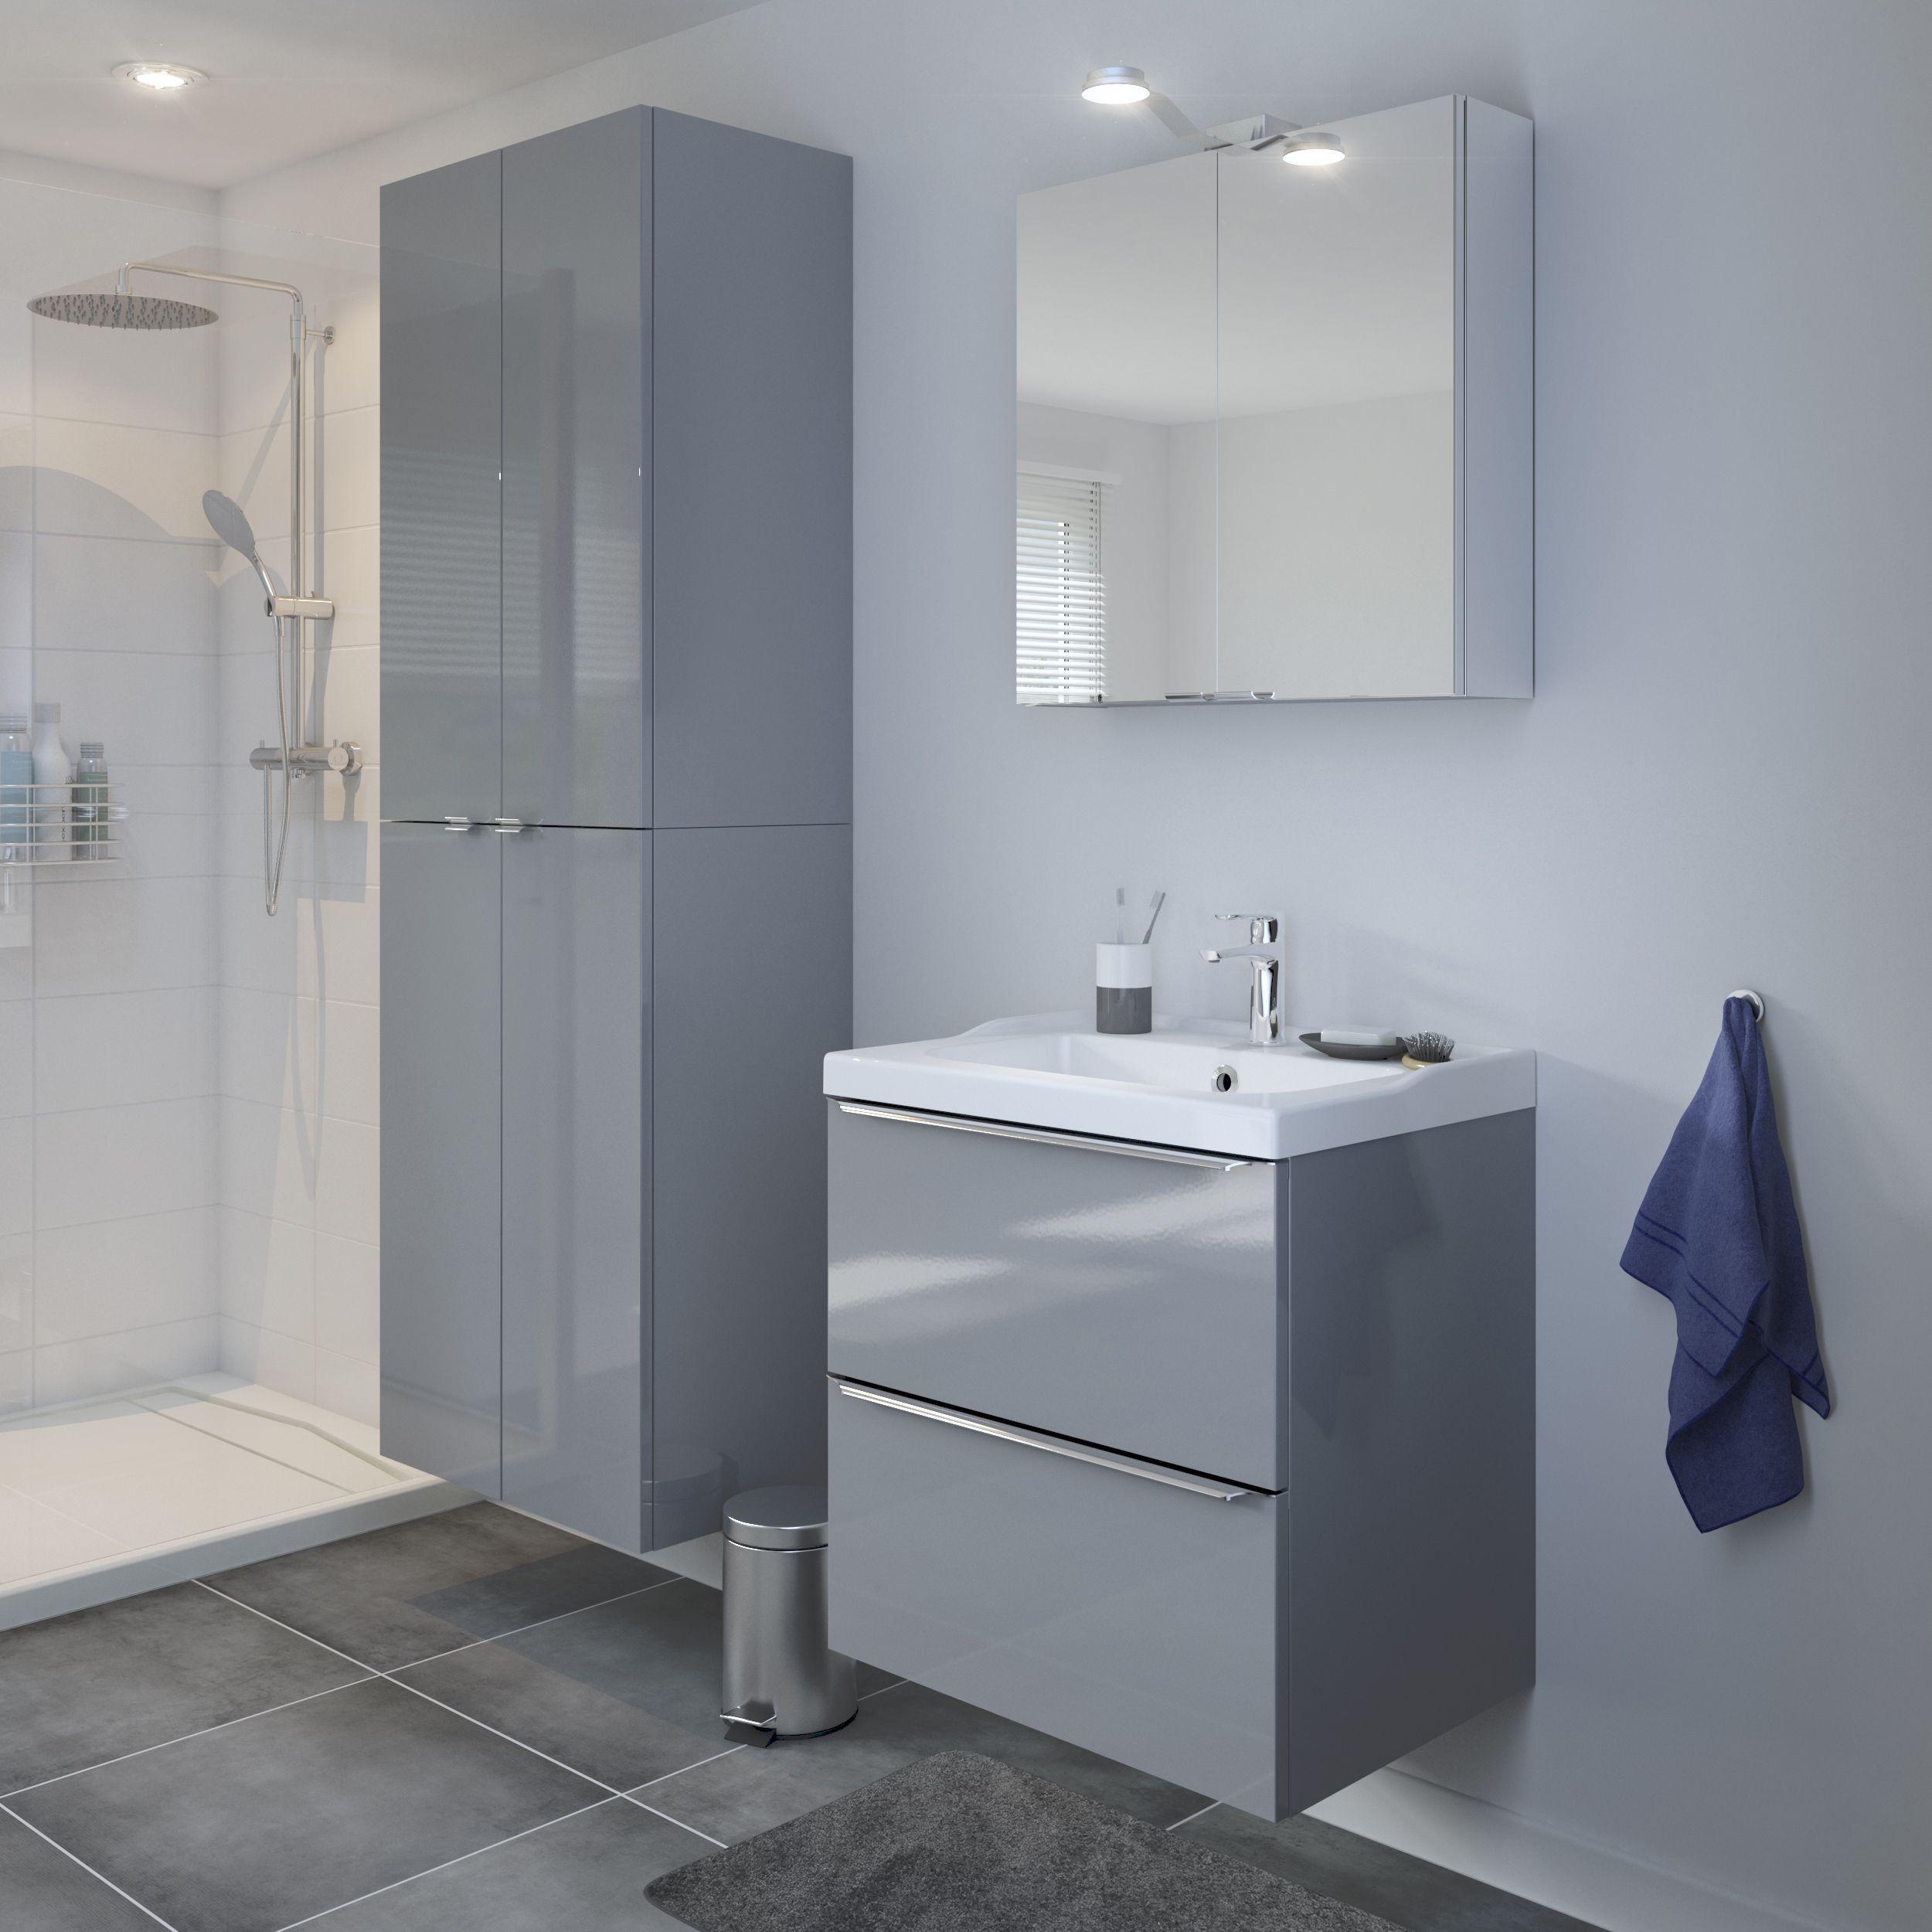 Goodhome Imandra Gloss Grey Deep Wall Cabinet W 600mm H 900mm Vanity Basin Basin Unit Modular Bathrooms